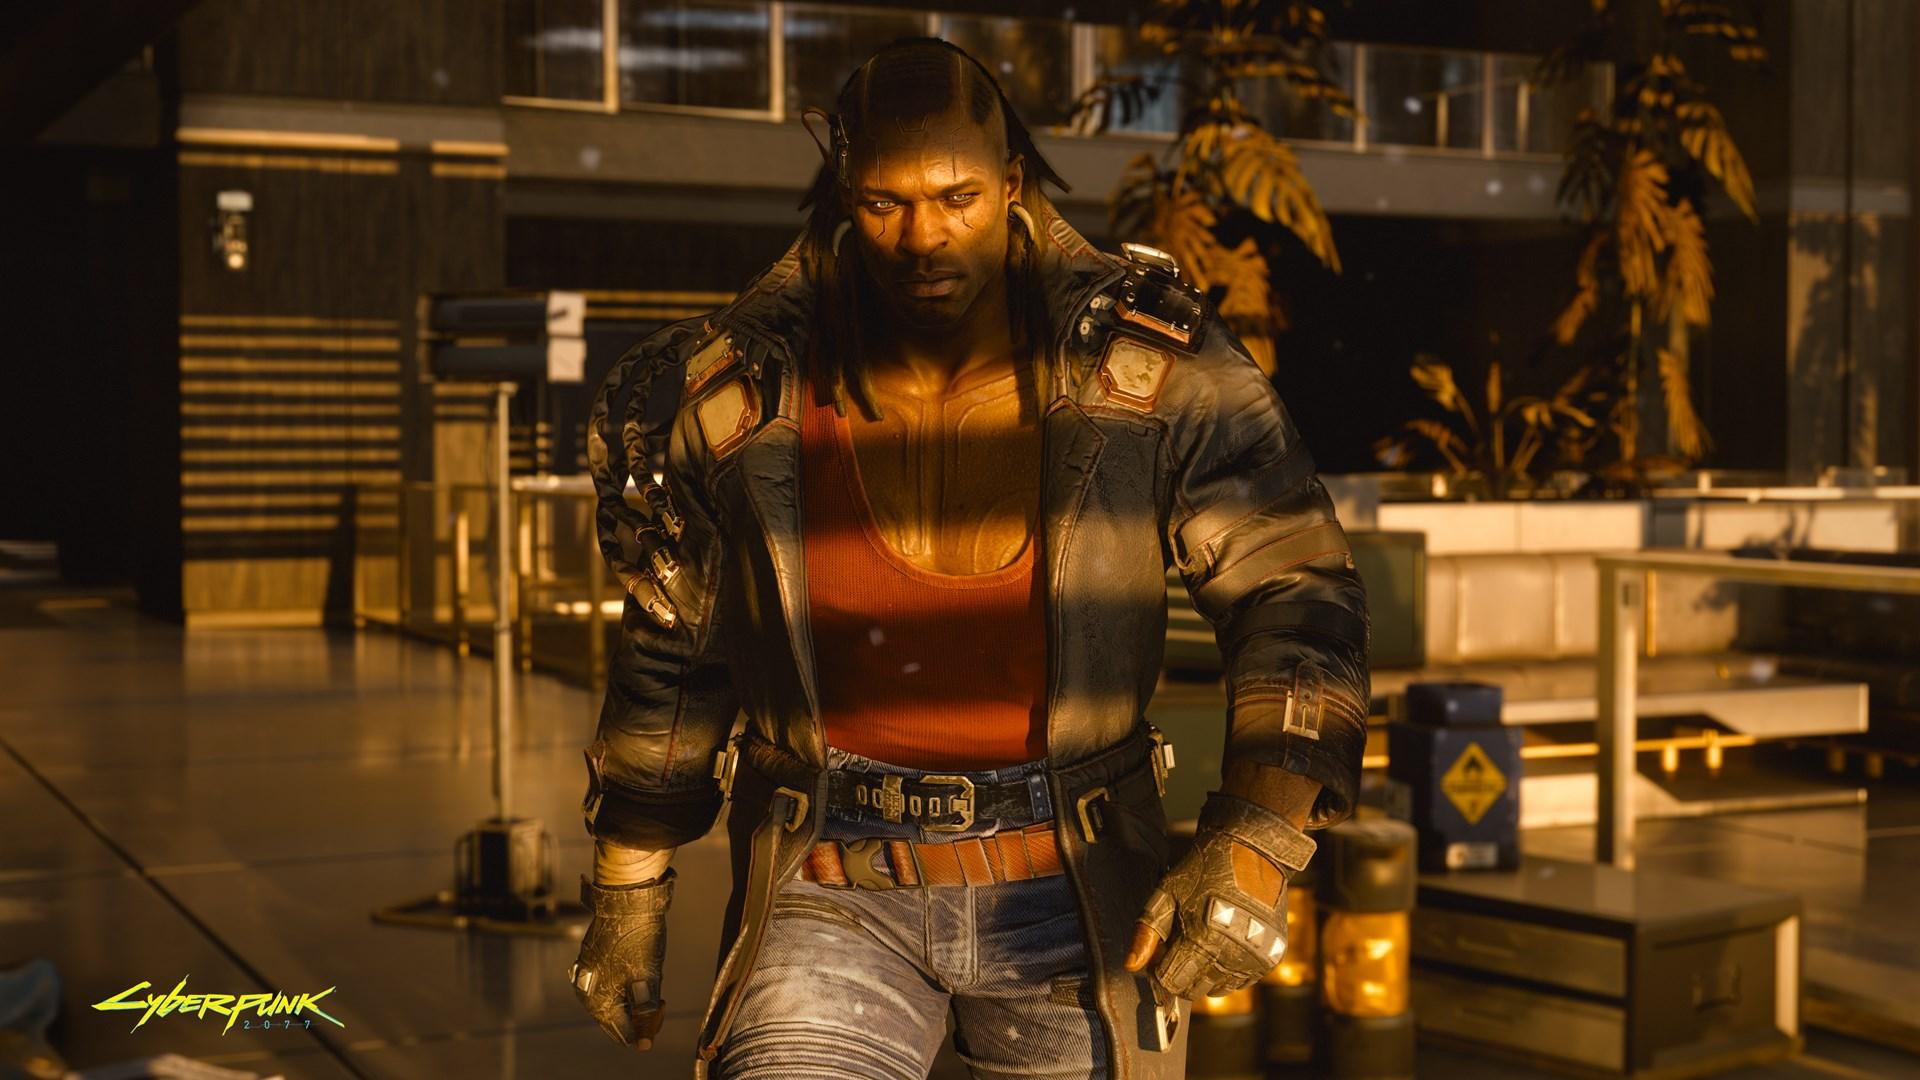 CDPR Releases More Cyberpunk 2077 E3 2019 Screenshots